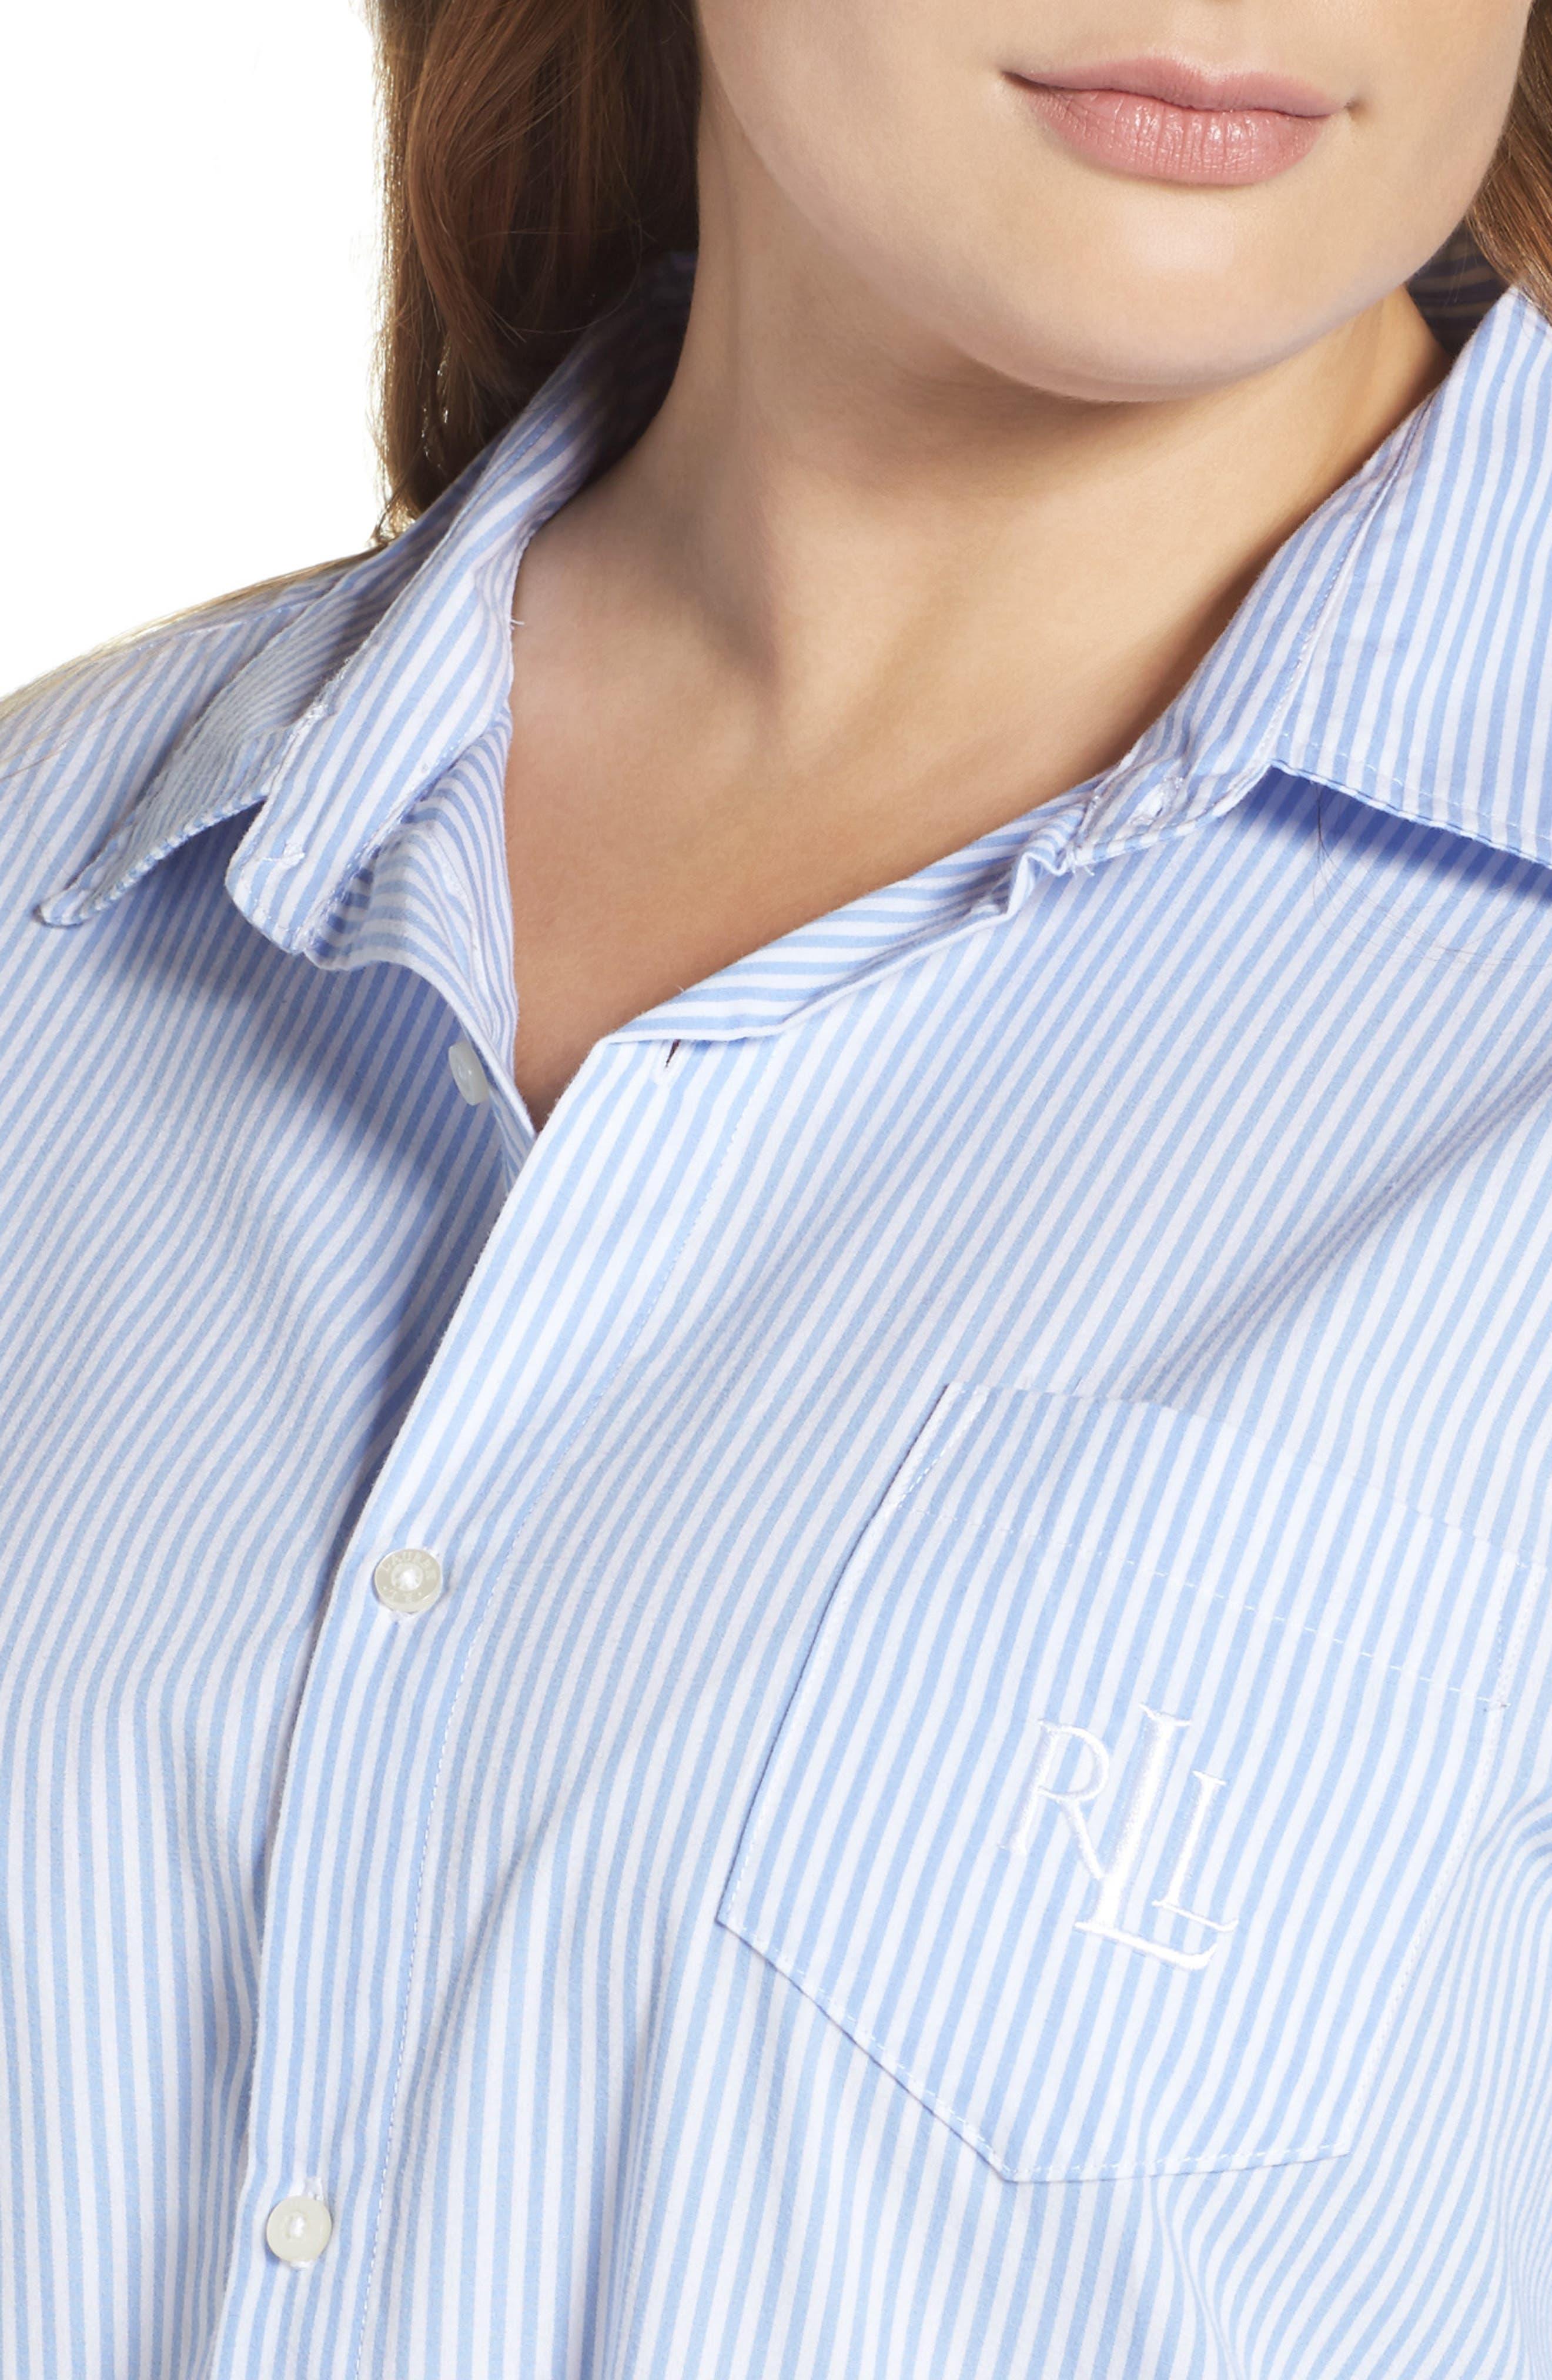 Sleep Shirt,                             Alternate thumbnail 4, color,                             Stripe French Blue/ White